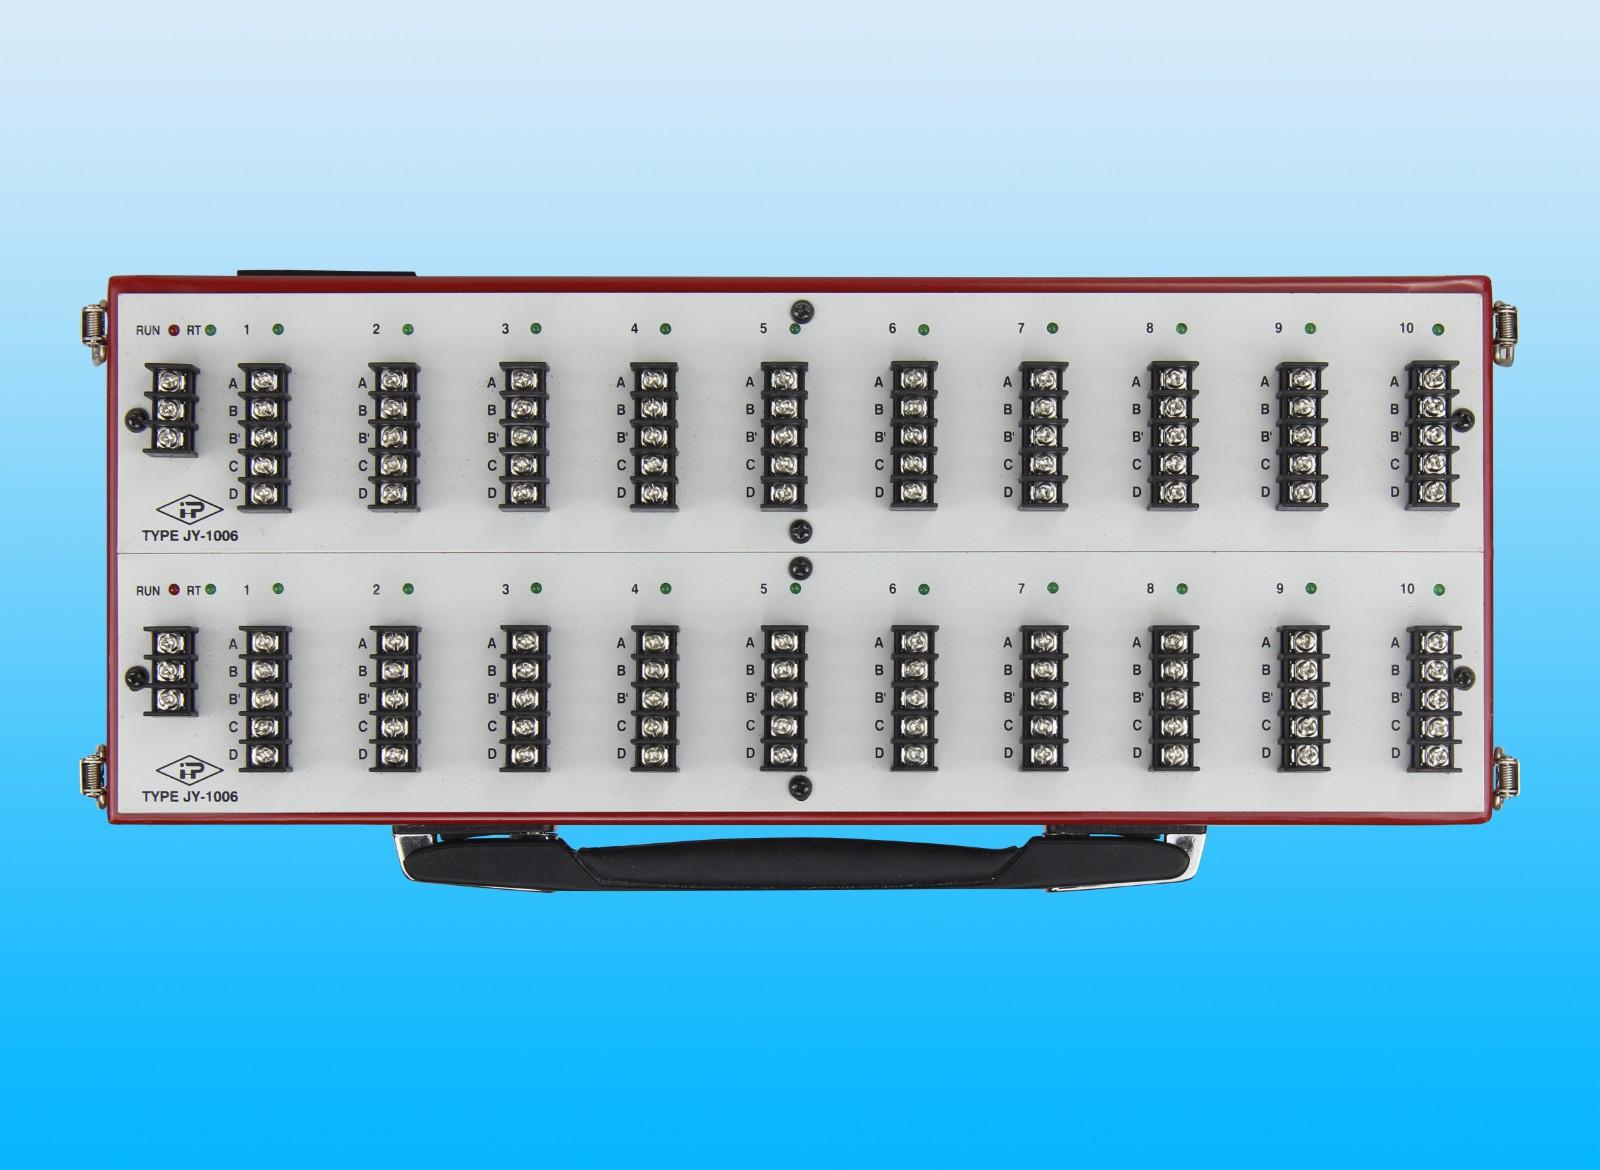 HP-JY1002静态优发国际顶级在线应变测试分析系统